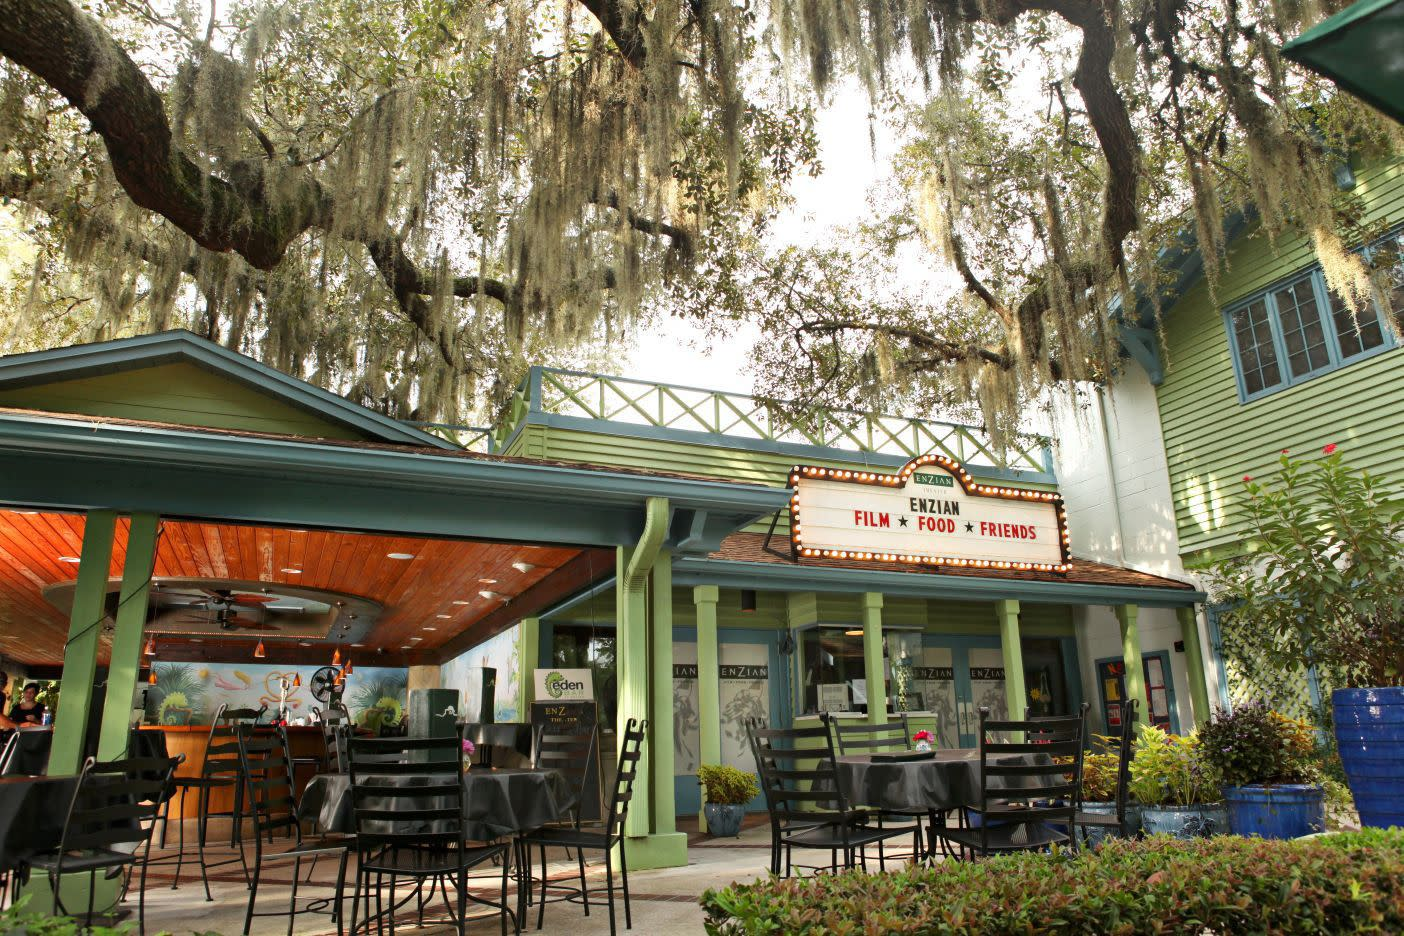 Enzian Theater in Maitland Near Orlando